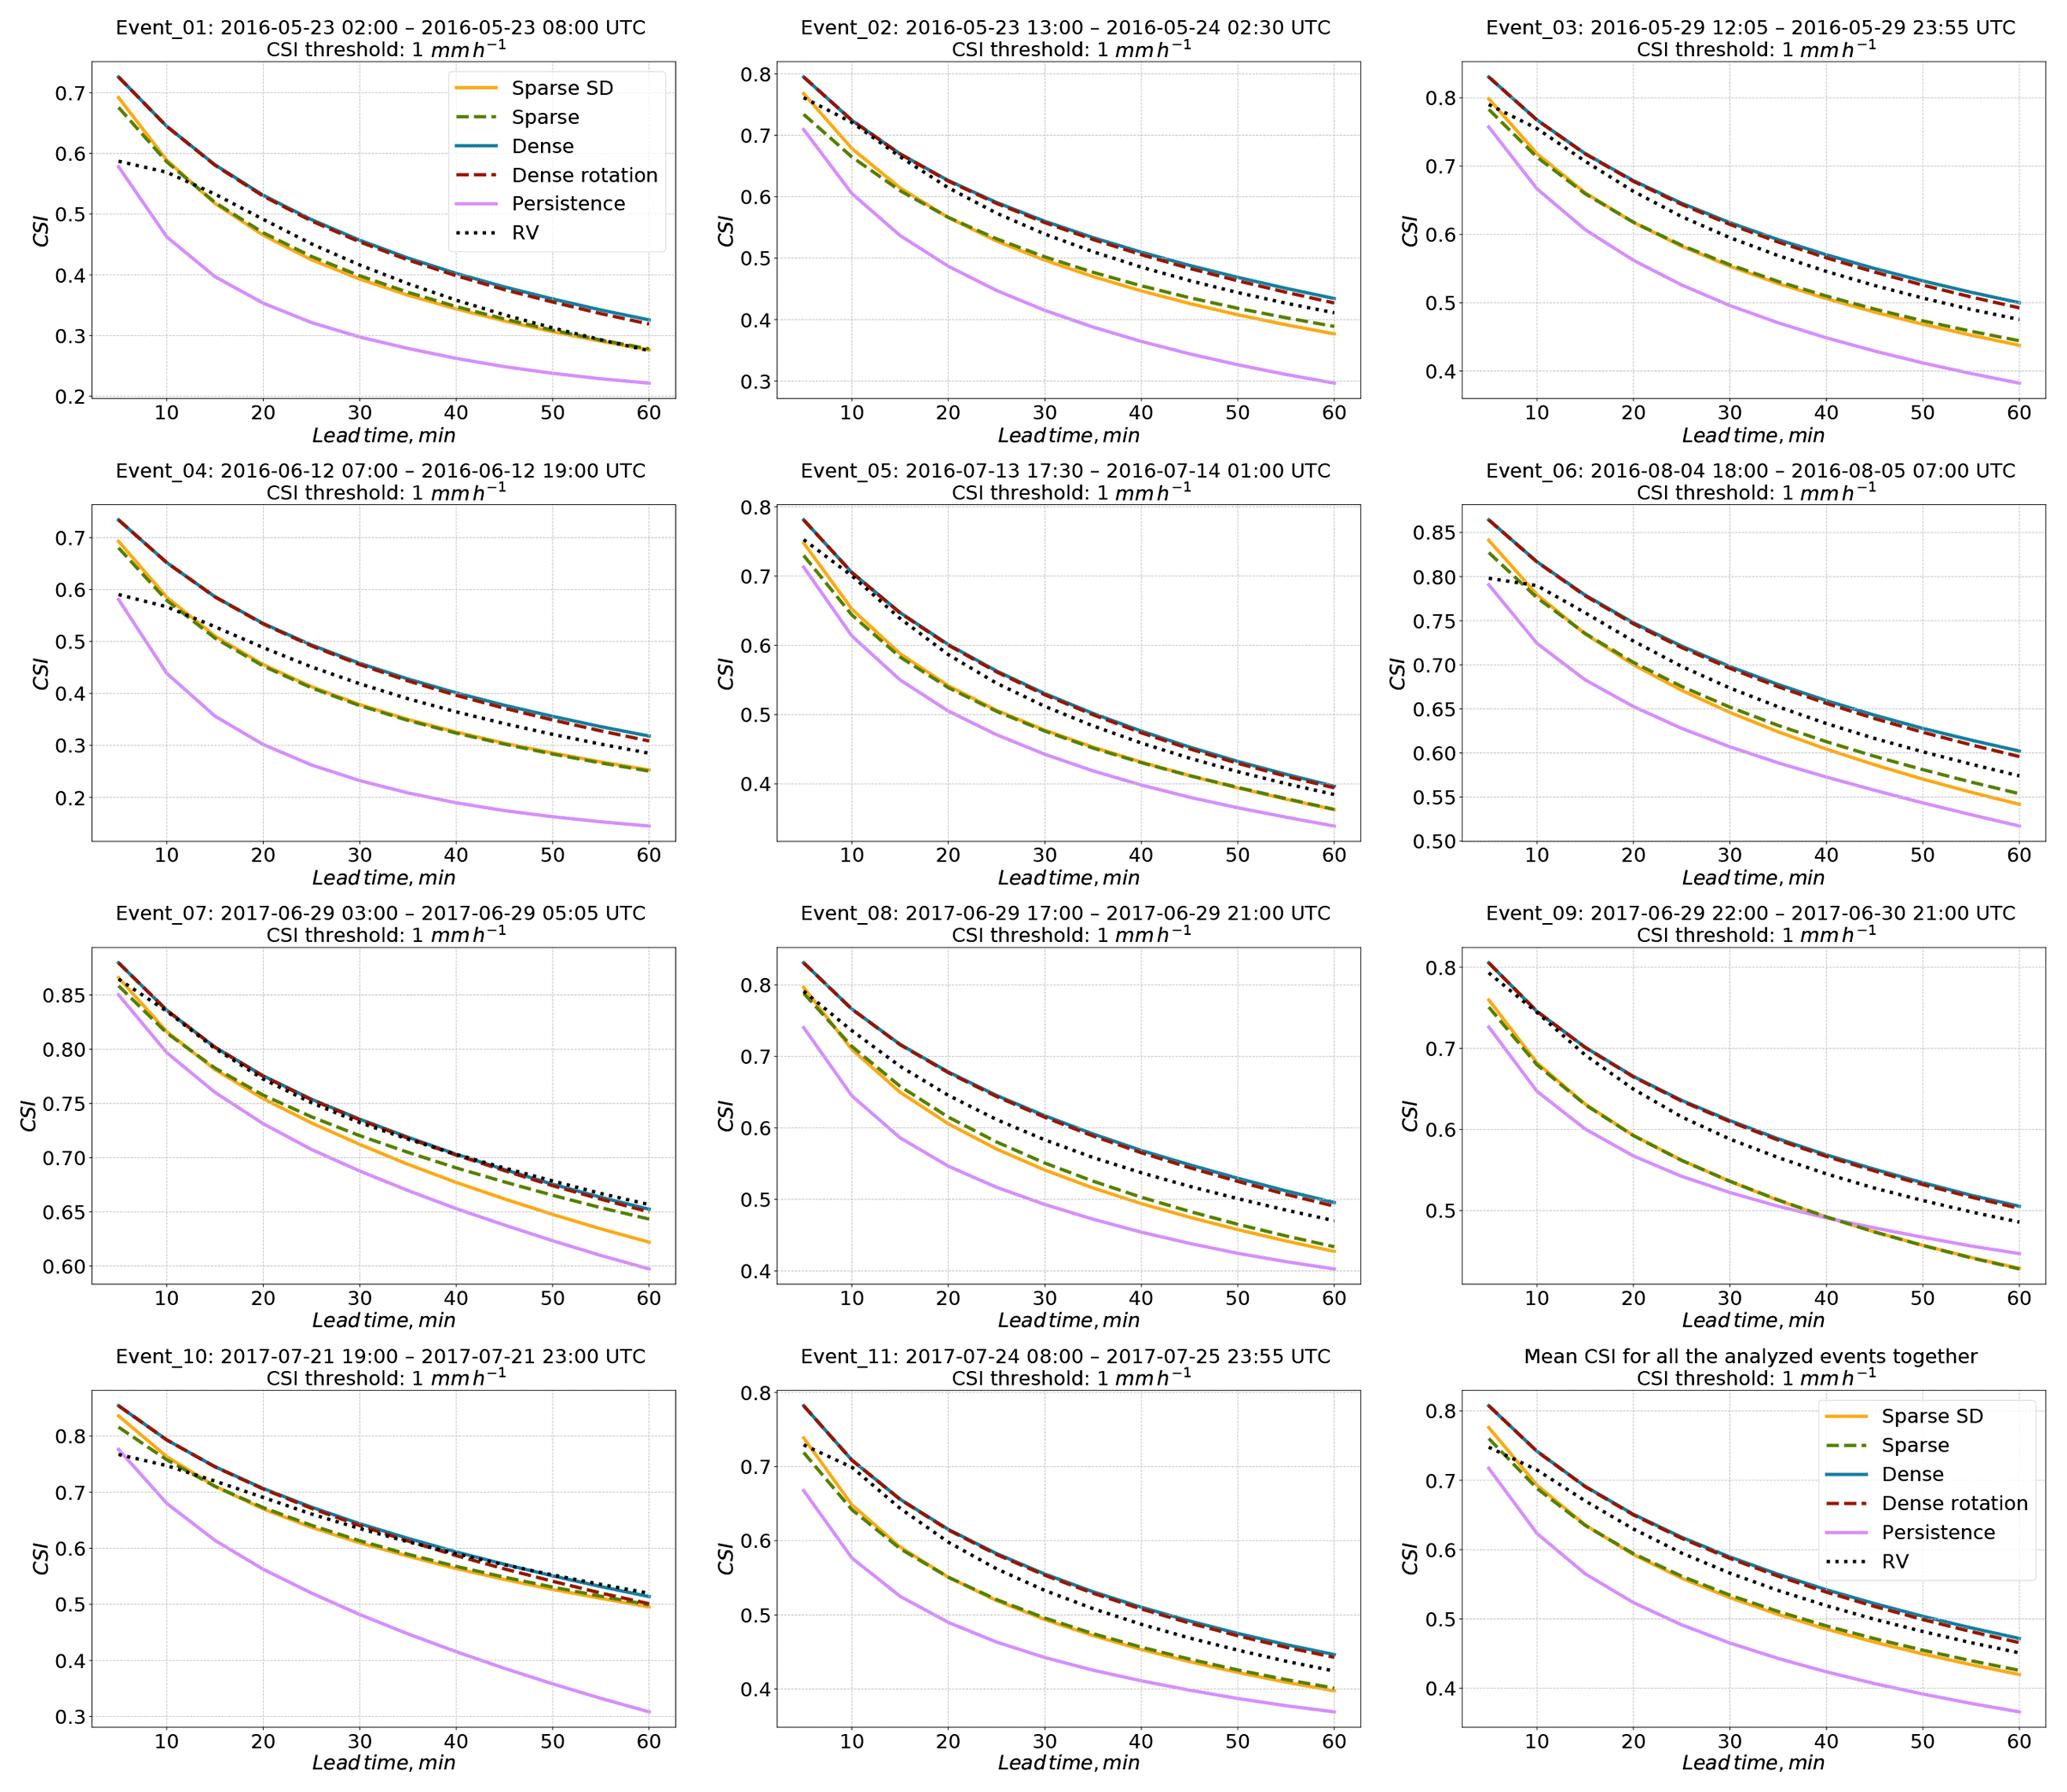 GMD - Optical flow models as an open benchmark for radar